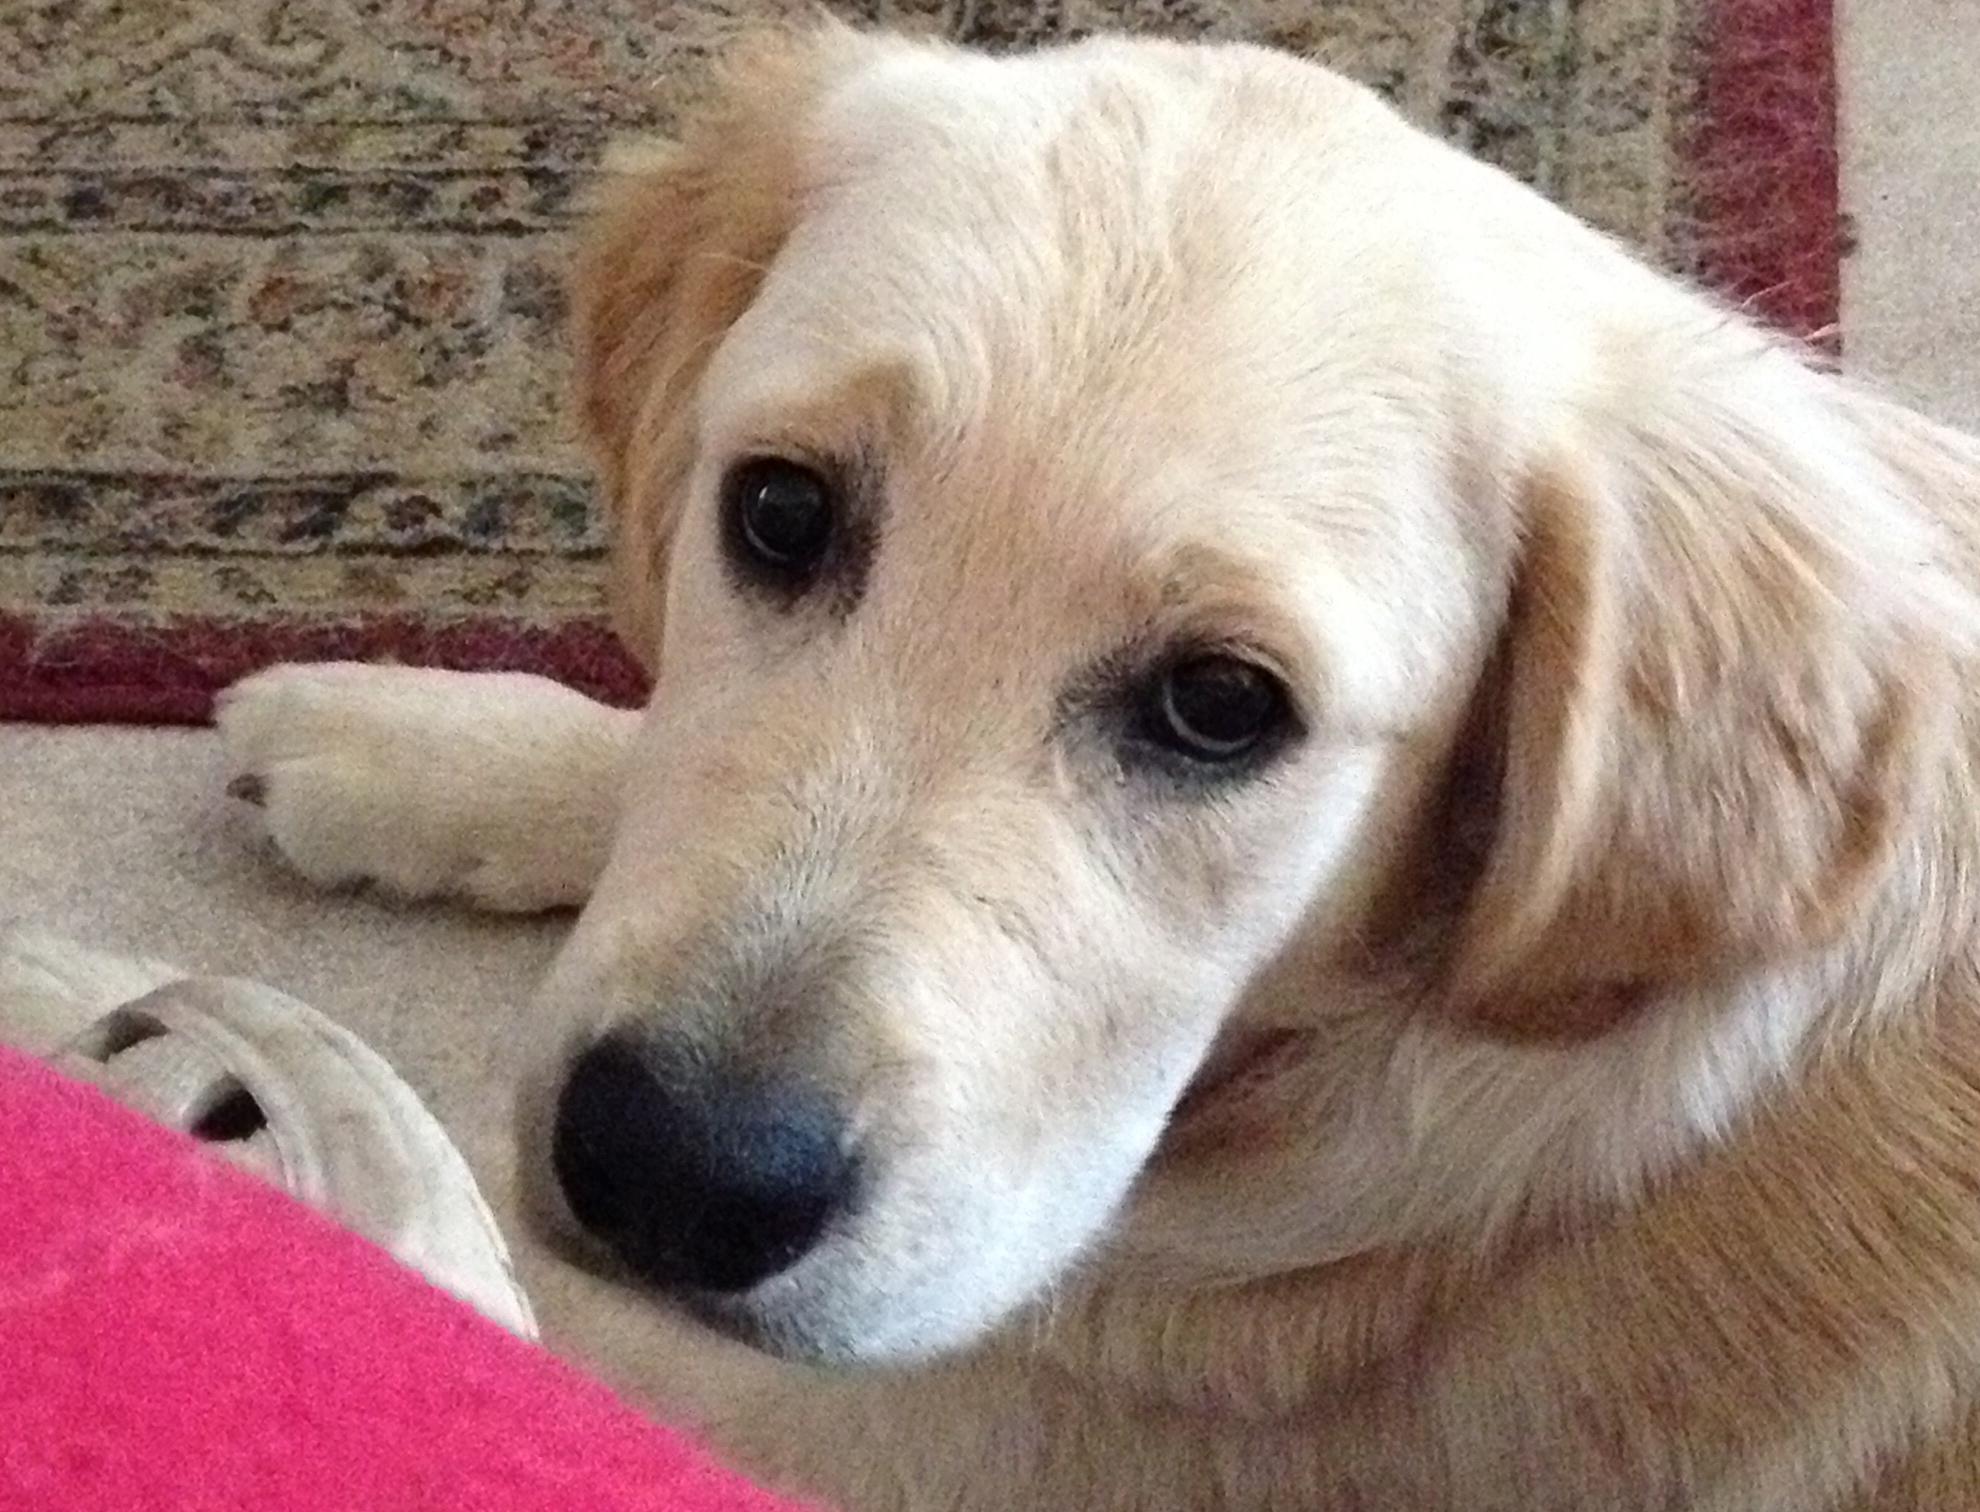 conarhu_golden_retrievers_perth_australia_ruth_connah_our_dogs_mia_gallery_5.jpg